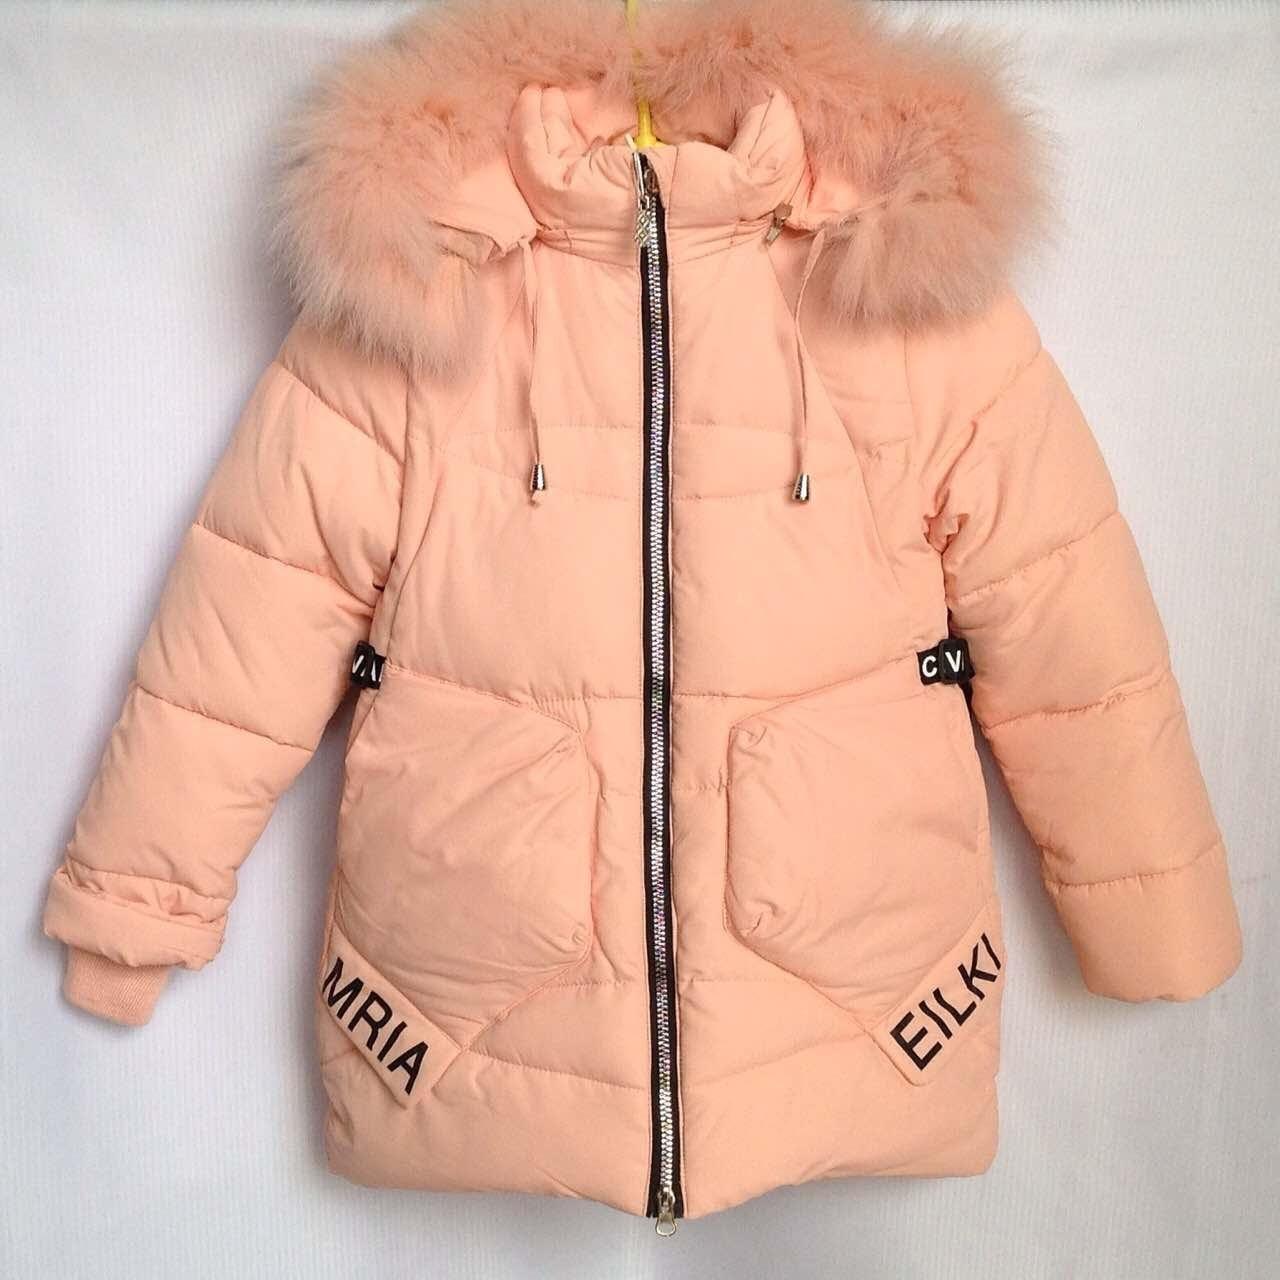 bc01dfd7afe4 Зимняя куртка для девочек цвет-пудра (8-12 лет), цена 720 грн ...